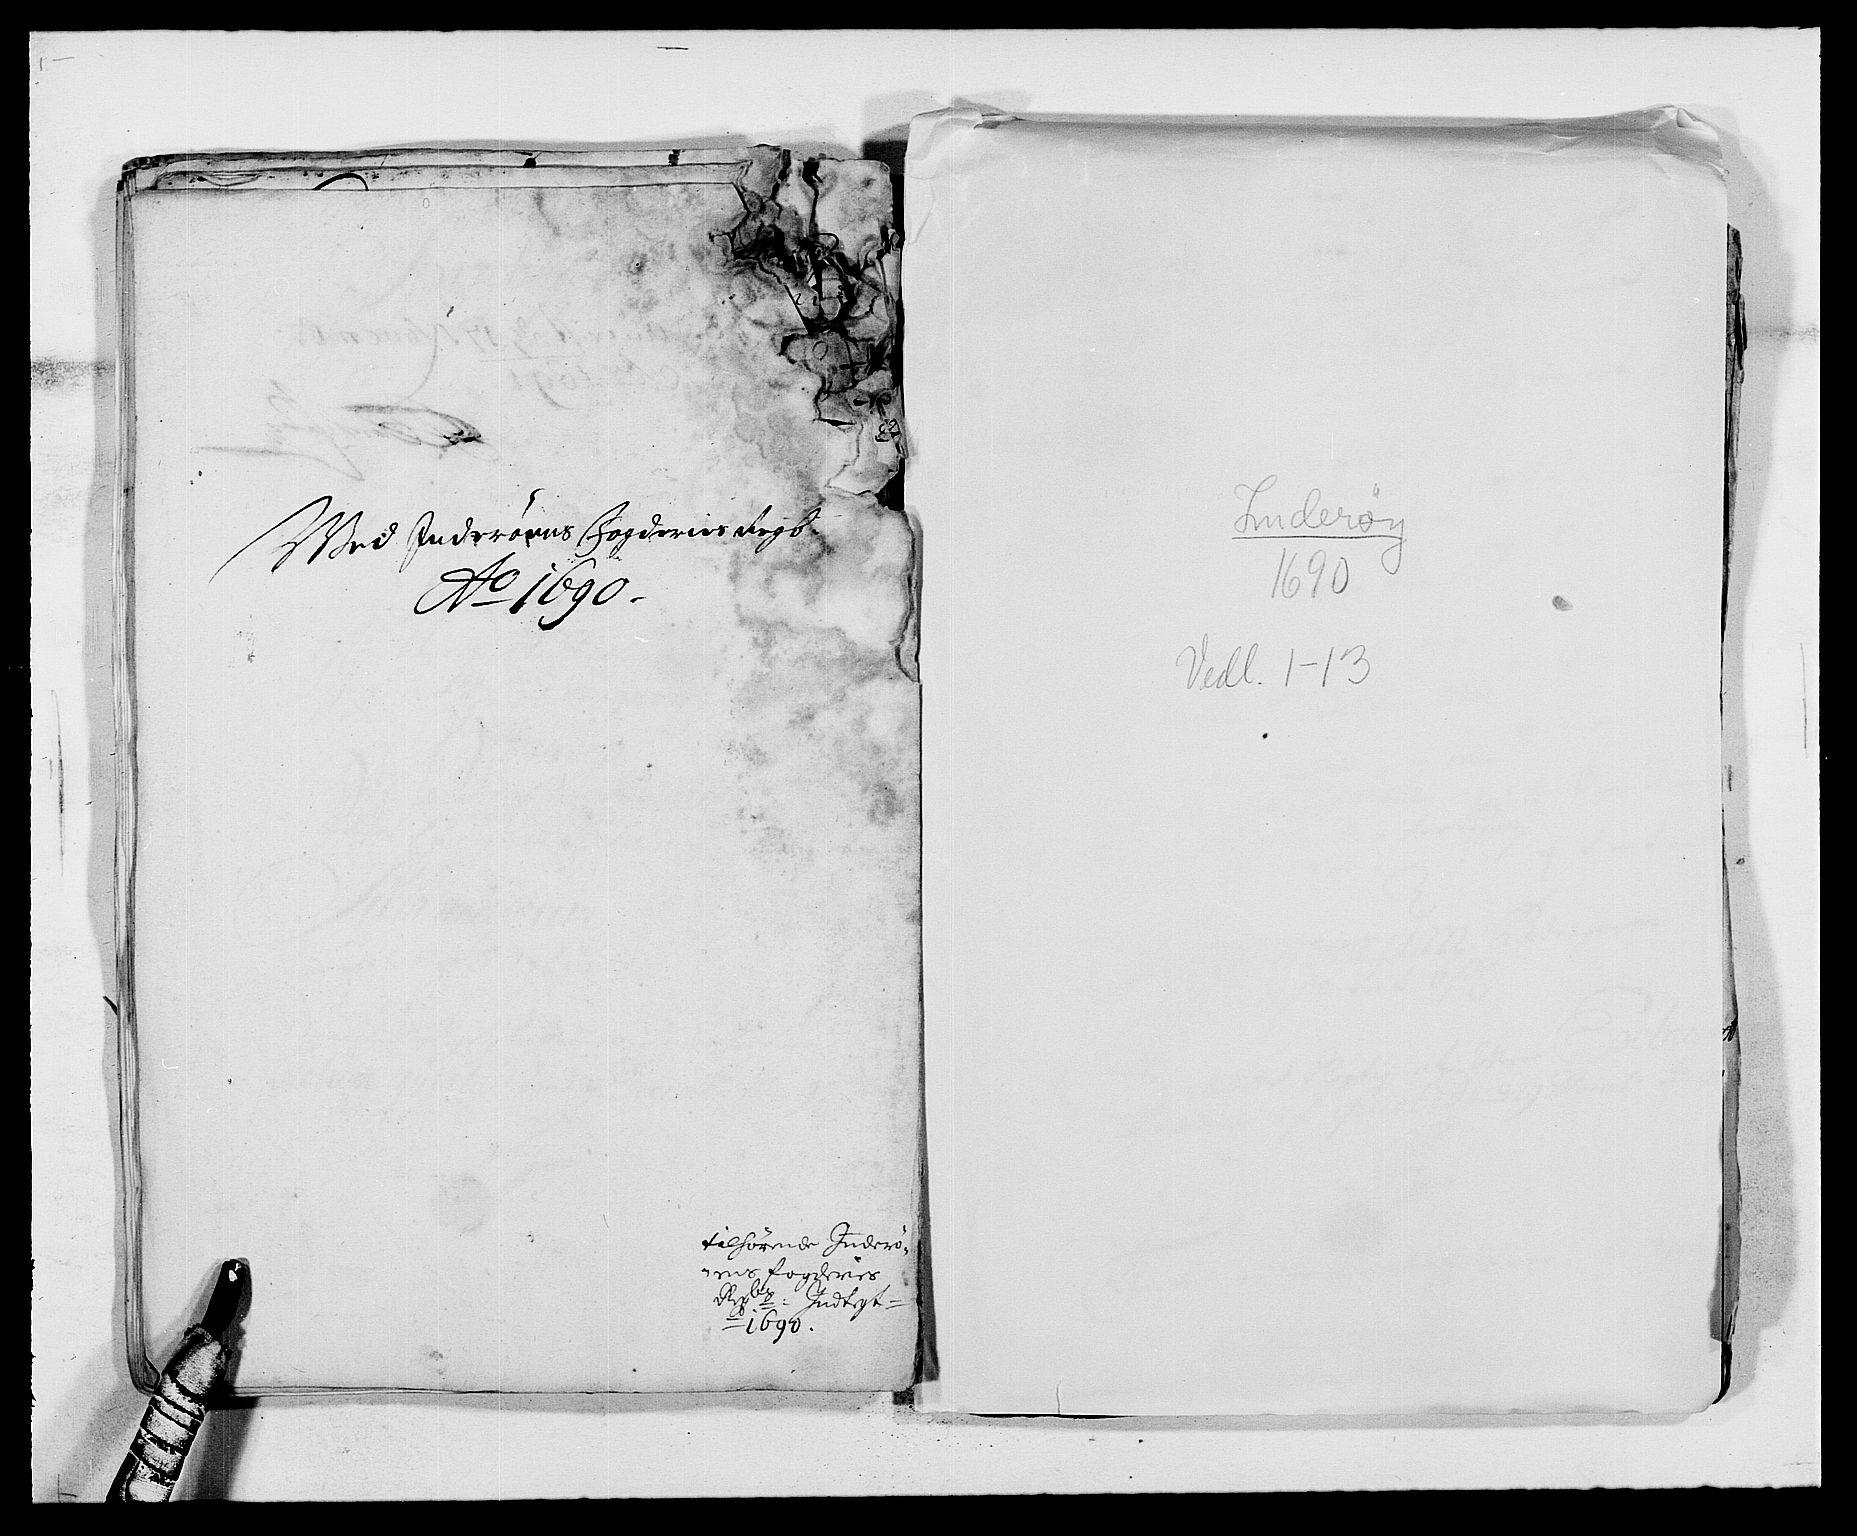 RA, Rentekammeret inntil 1814, Reviderte regnskaper, Fogderegnskap, R63/L4307: Fogderegnskap Inderøy, 1690-1691, s. 181